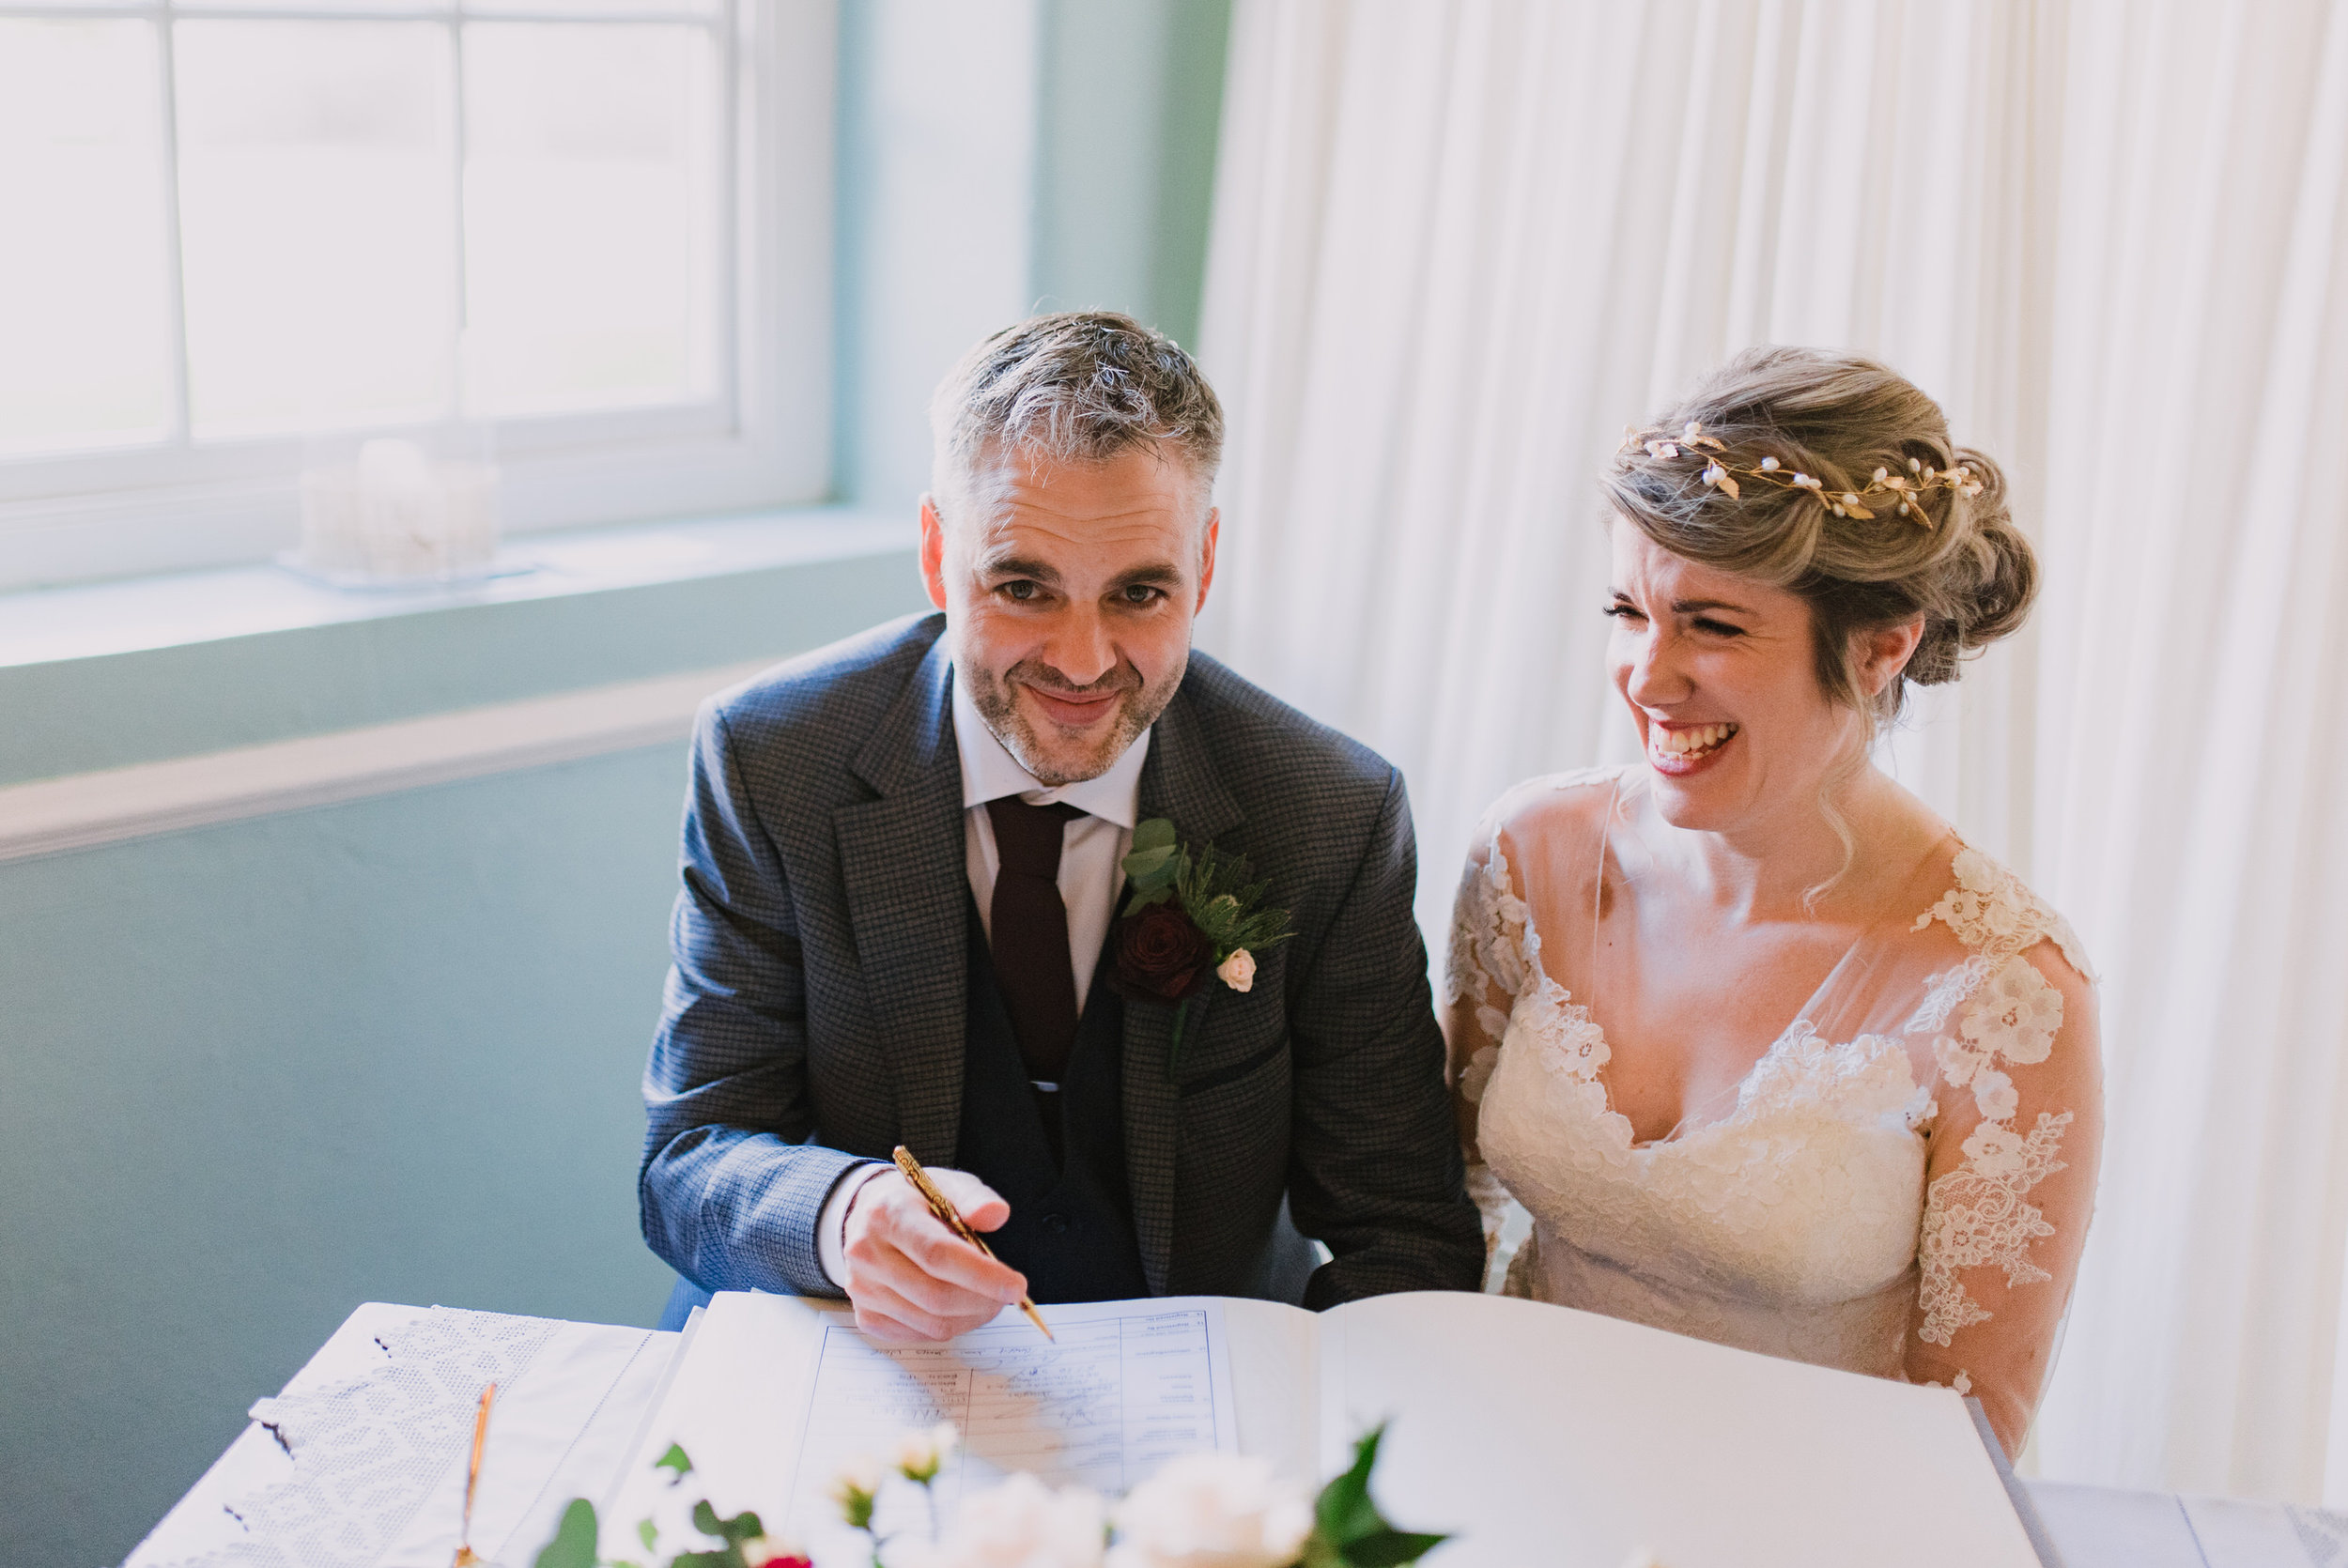 lissanoure castle wedding, northern ireland wedding photographer, romantic northern irish wedding venue, castle wedding ireland, natural wedding photography ni (64).jpg